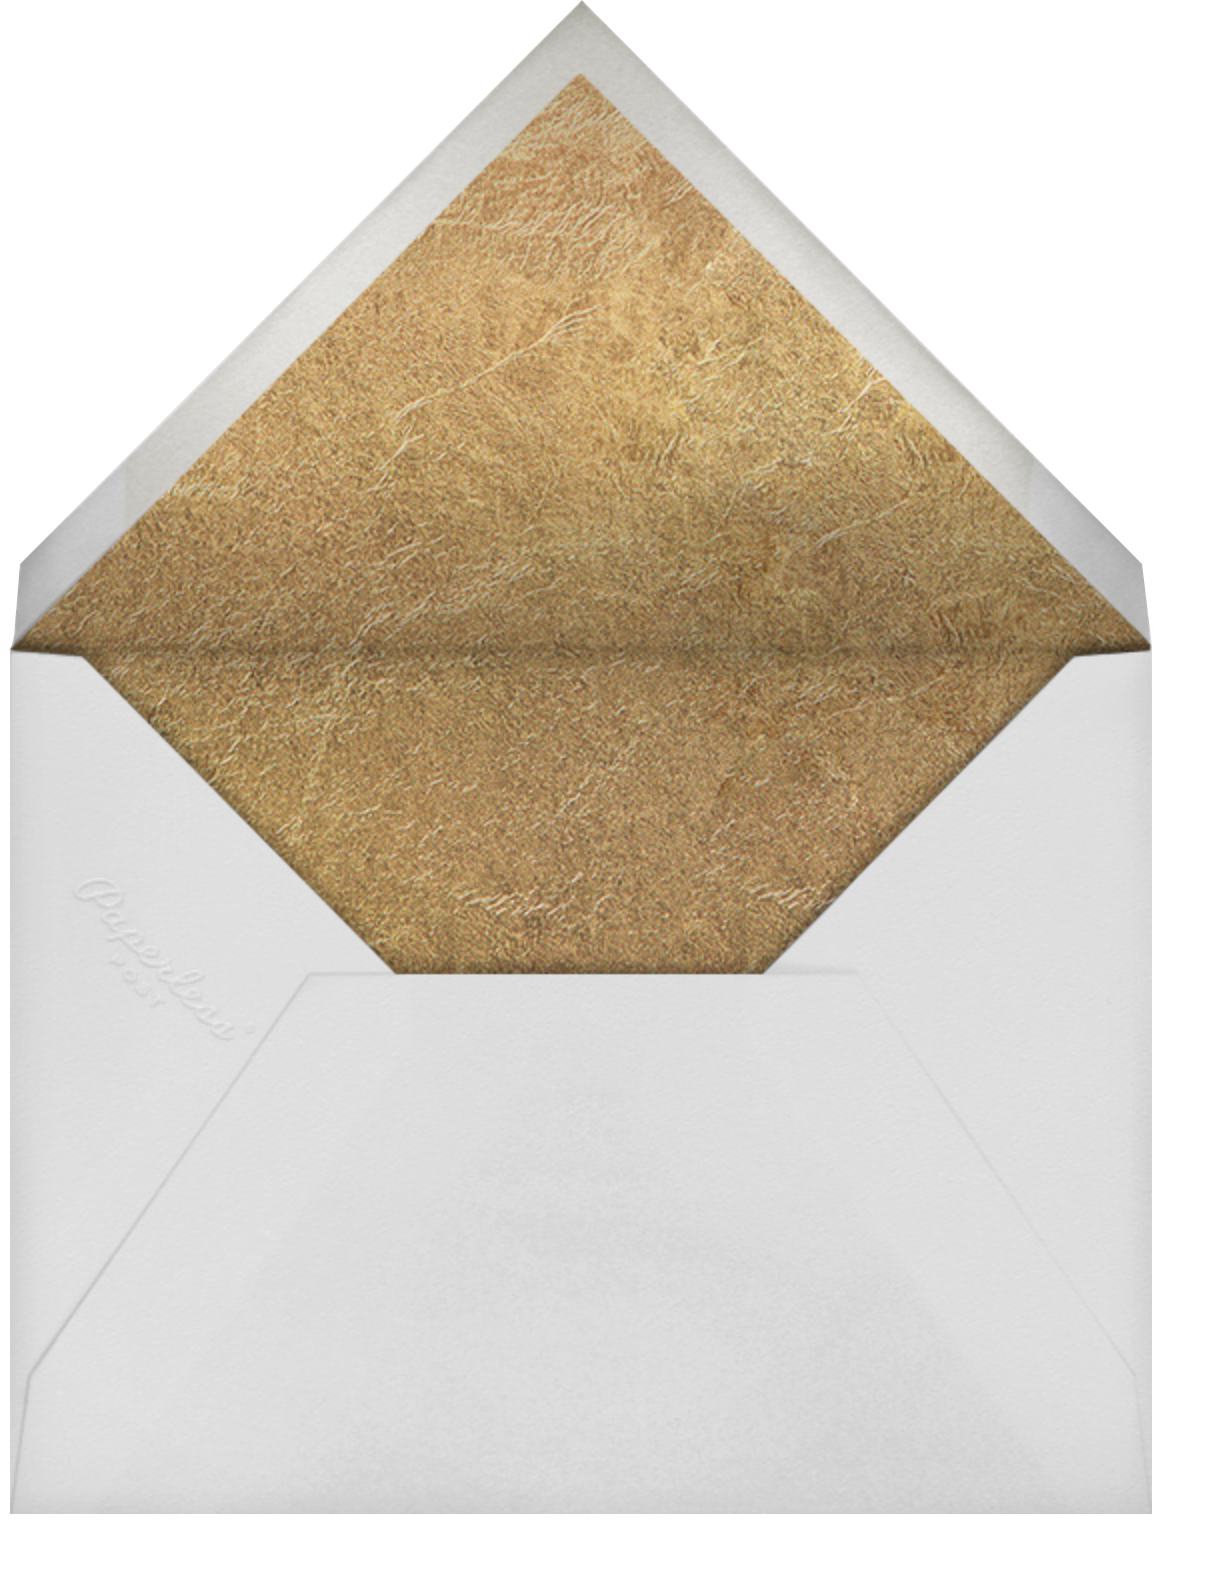 Garde (Invitation) - Teal - Kelly Wearstler - All - envelope back